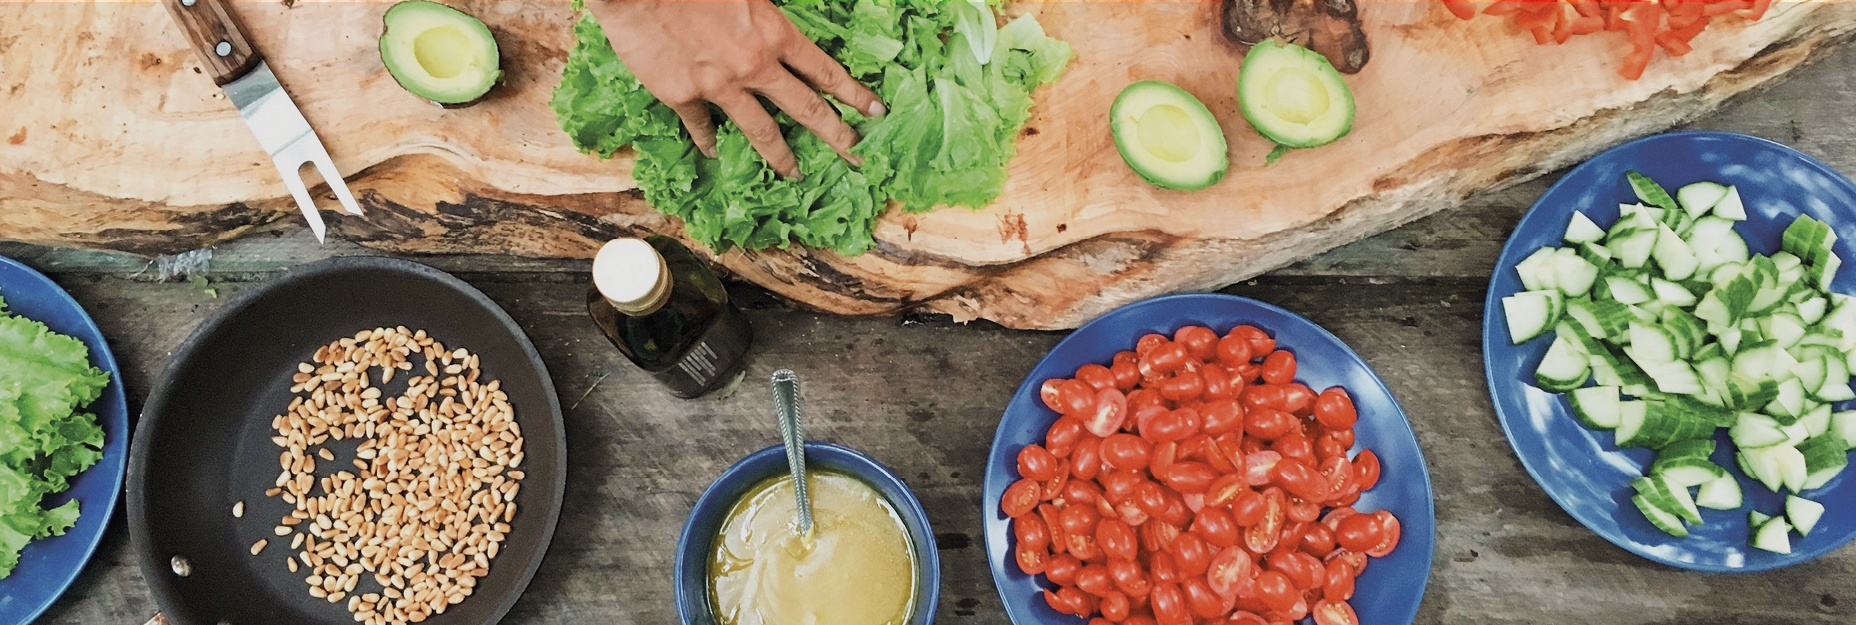 Sustainable Kitchen Guide Blog.jpg